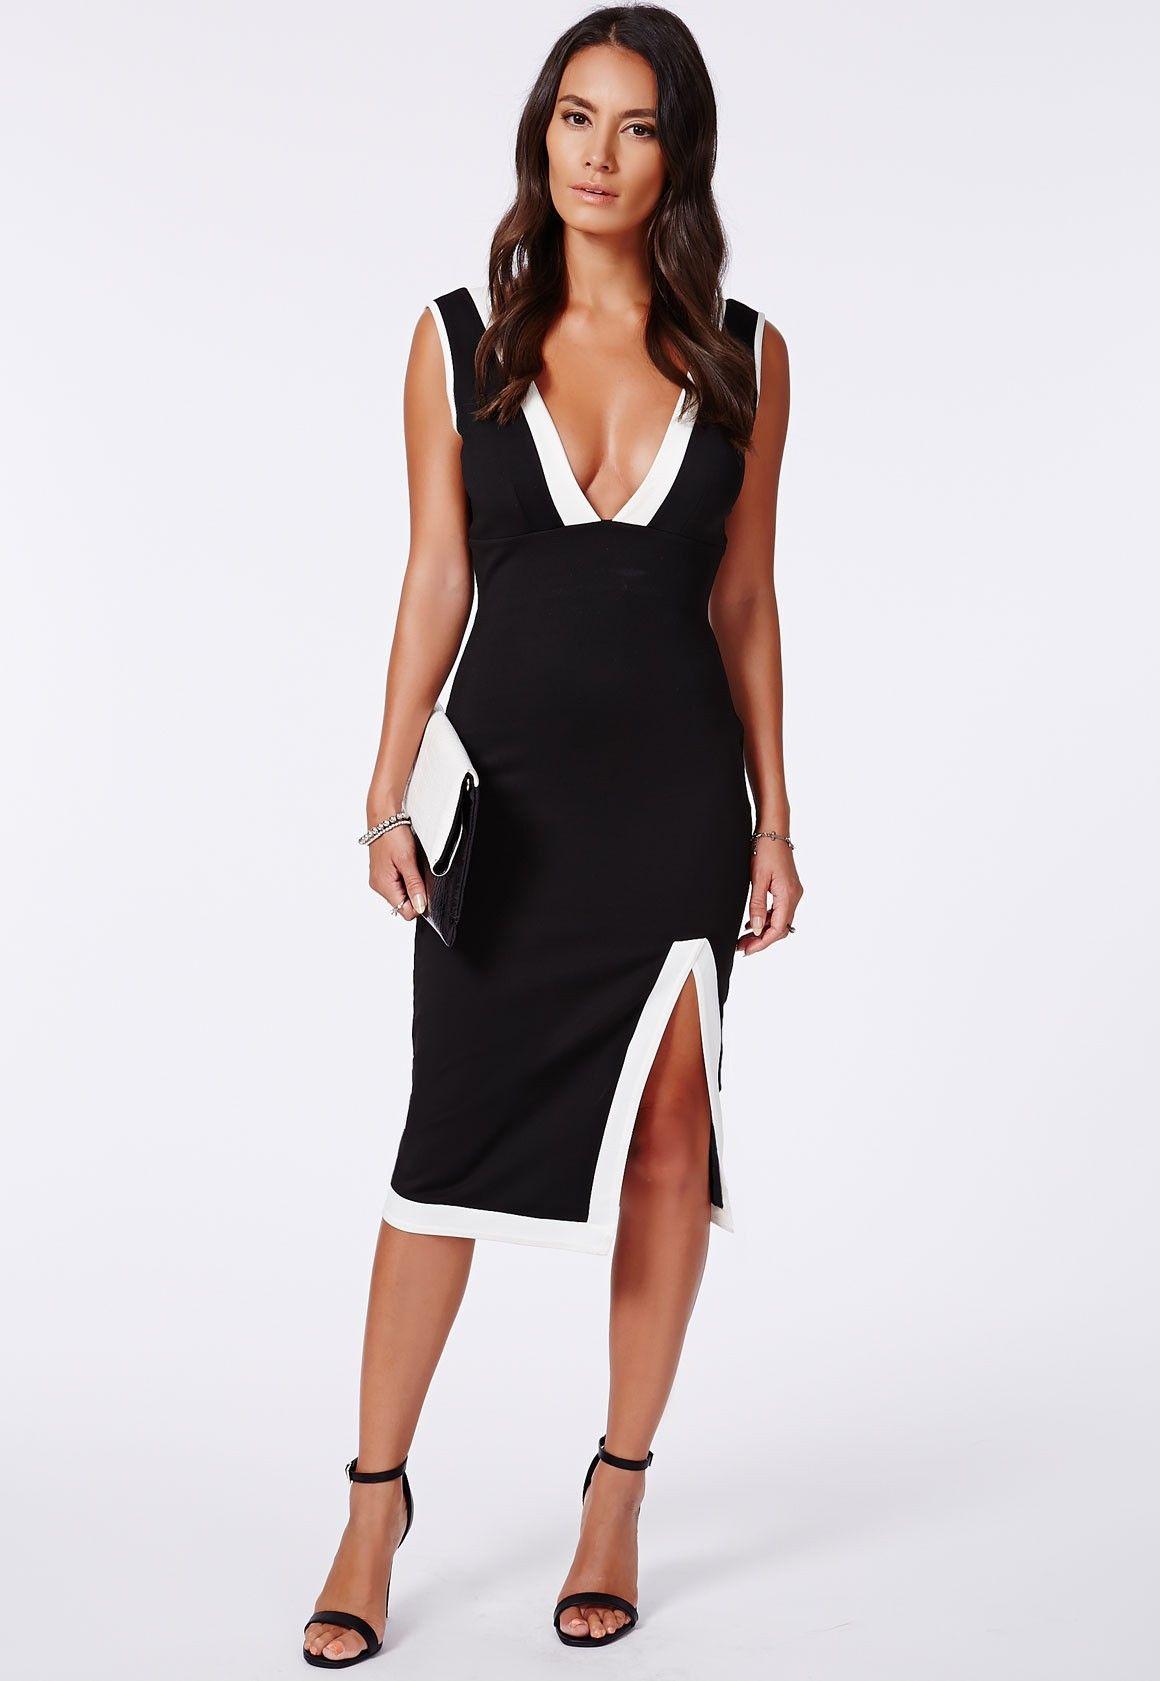 Sally Scuba Black with White Contrast Midi Dress - Dresses - Midi Dresses - Missguided